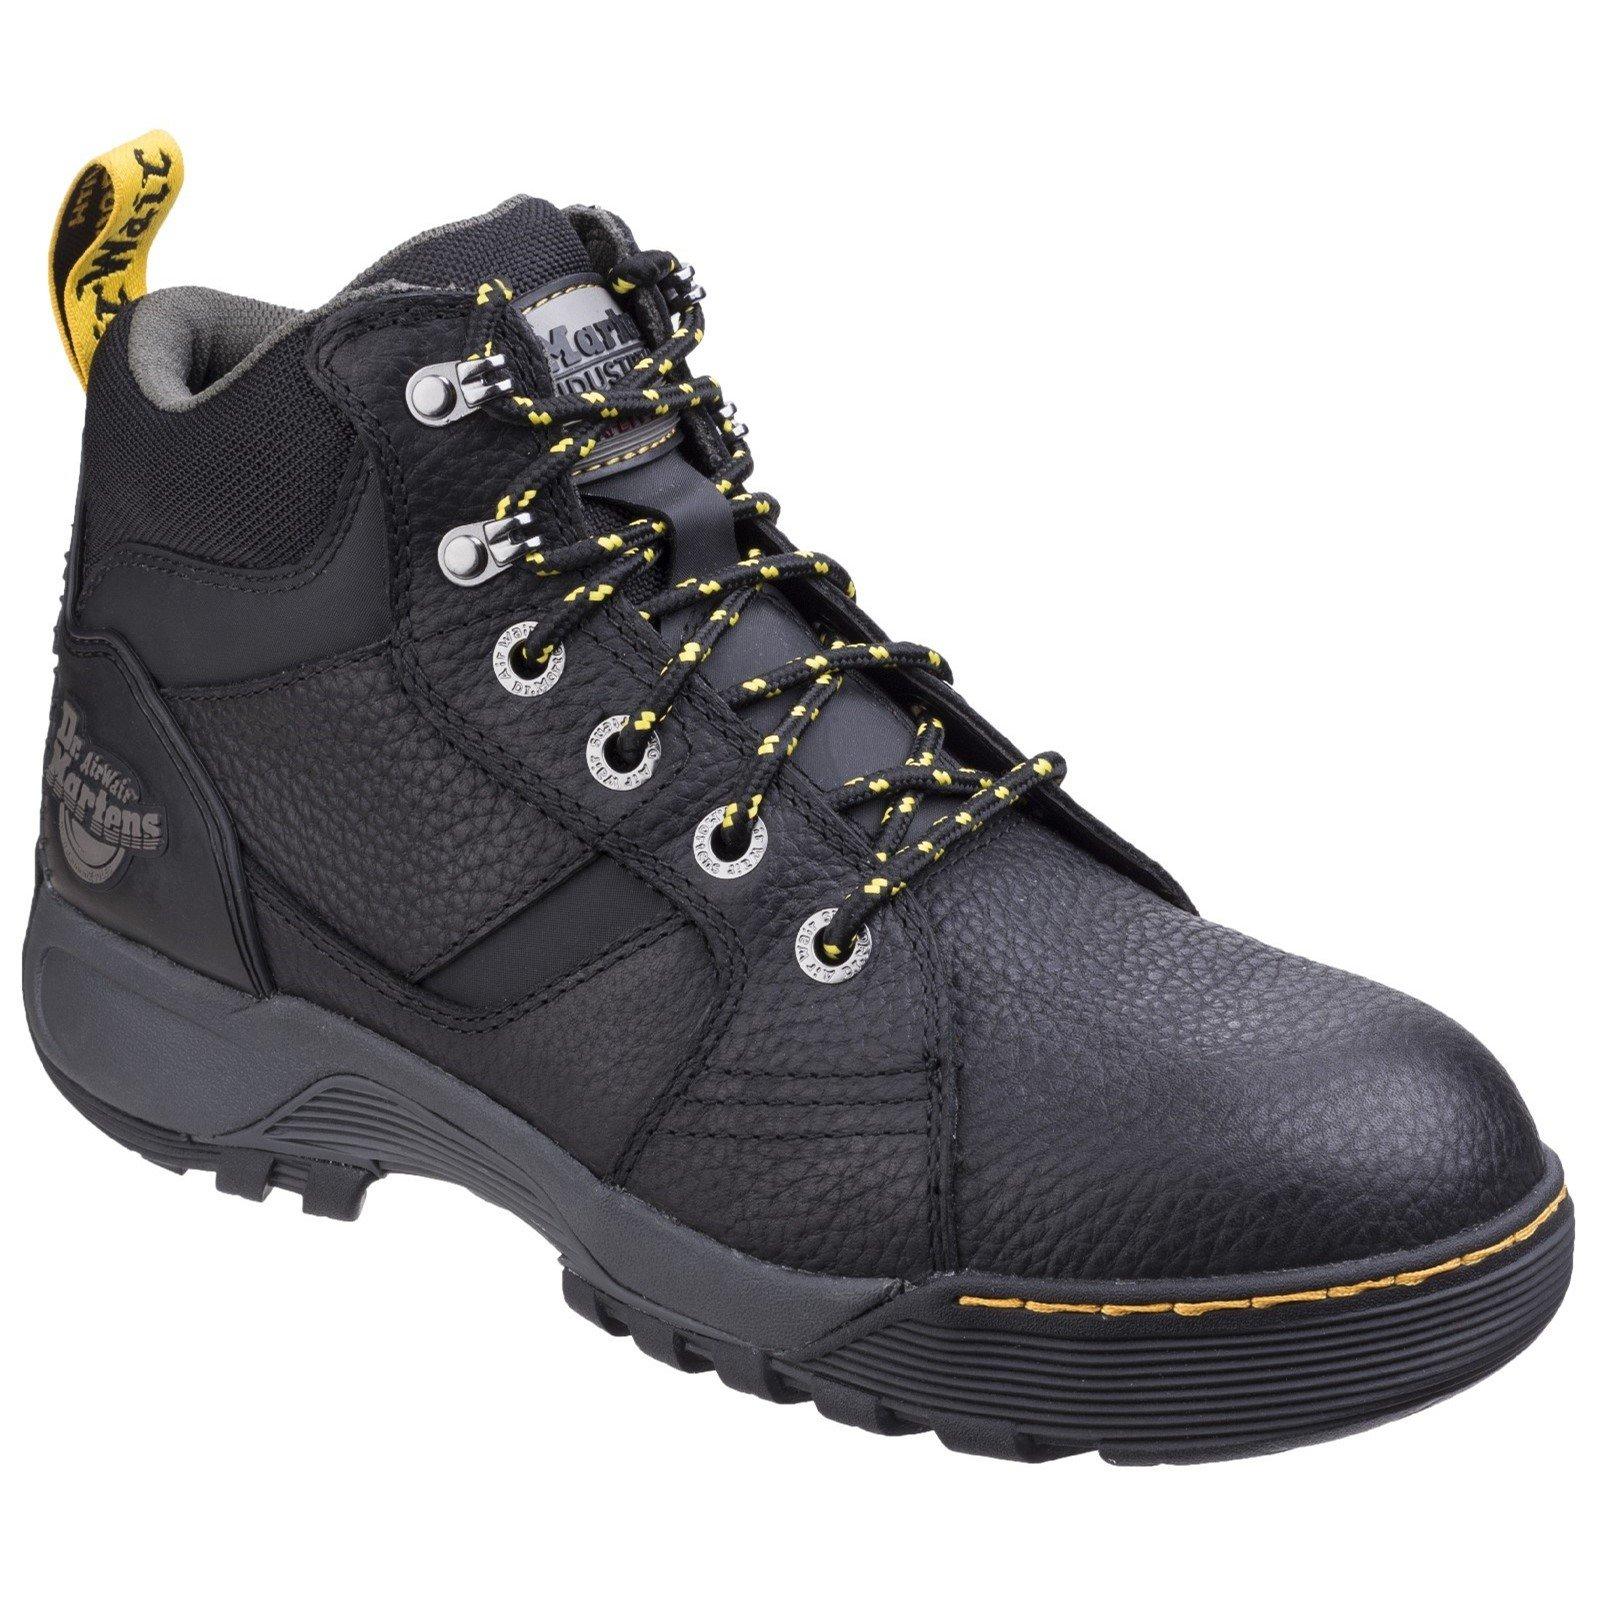 Dr Martens Men's Grapple Safety Boot Various Colours 26023 - Black 3